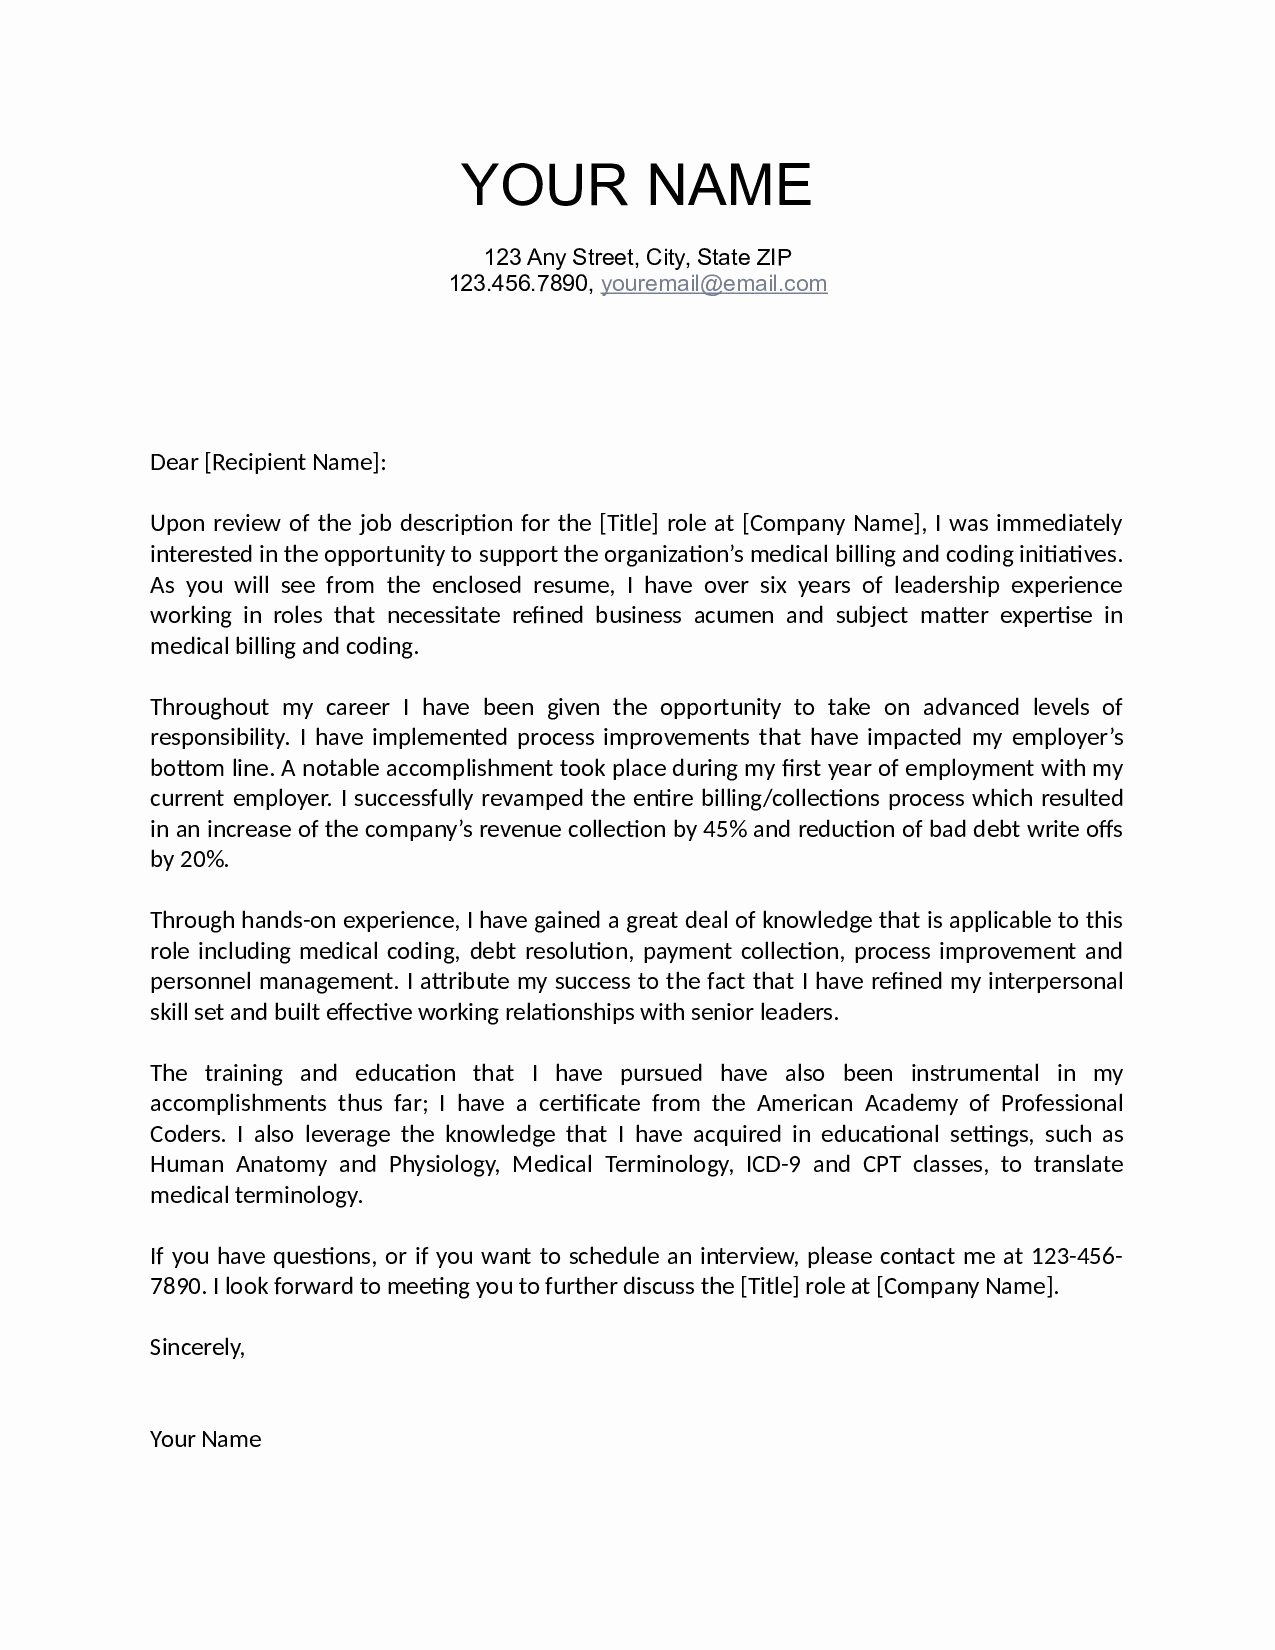 Service Dog Letter Template - Beautiful Service Dog Certificate Template